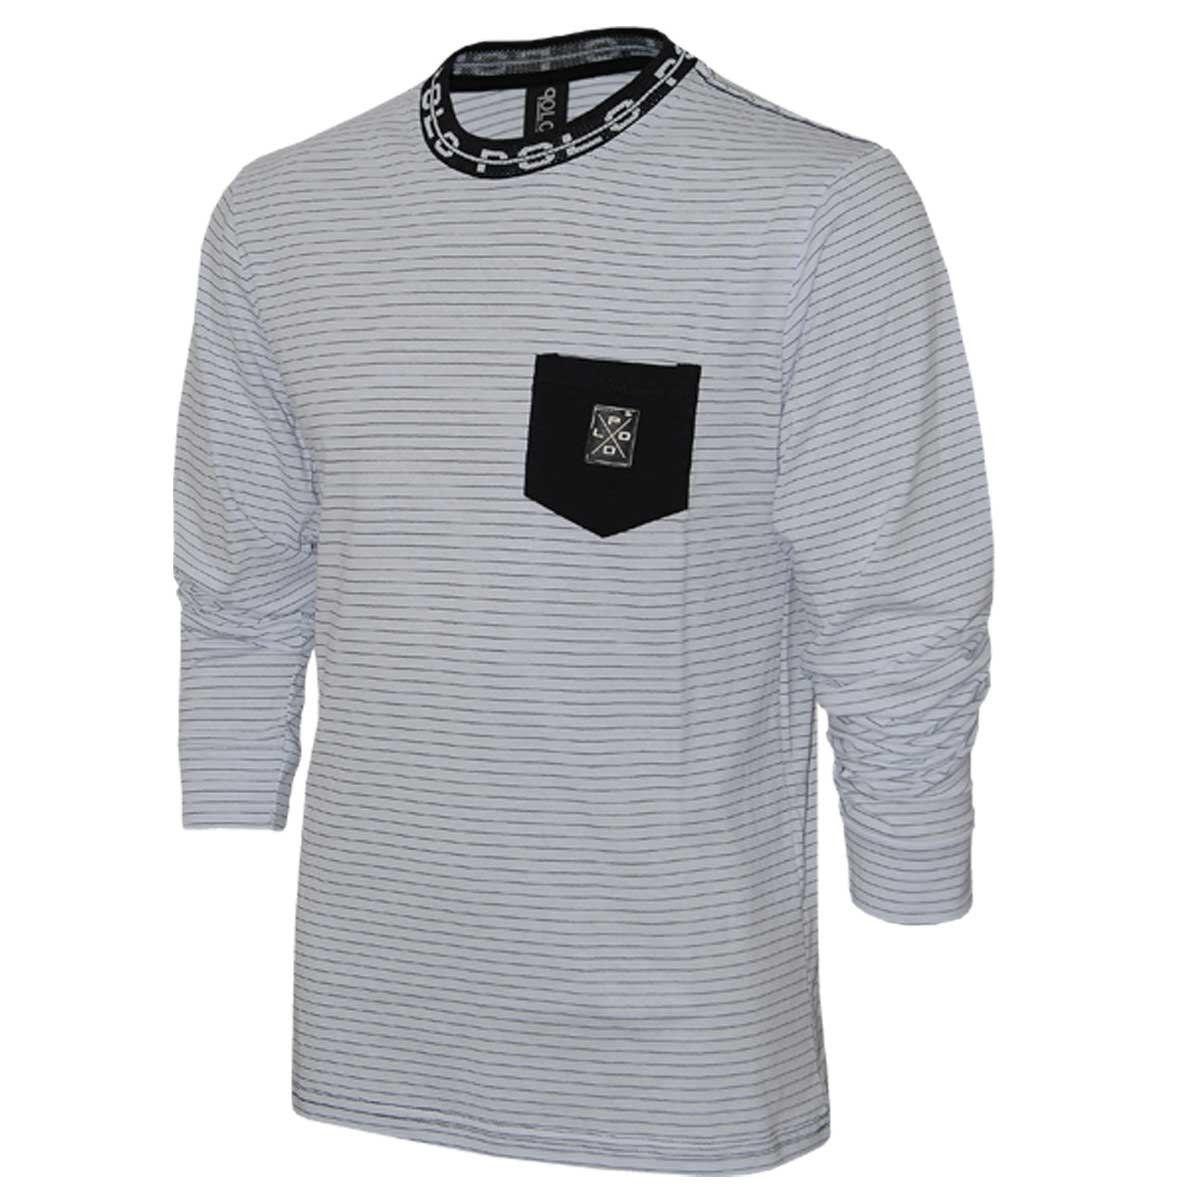 Camiseta Manga Longa com Bolso